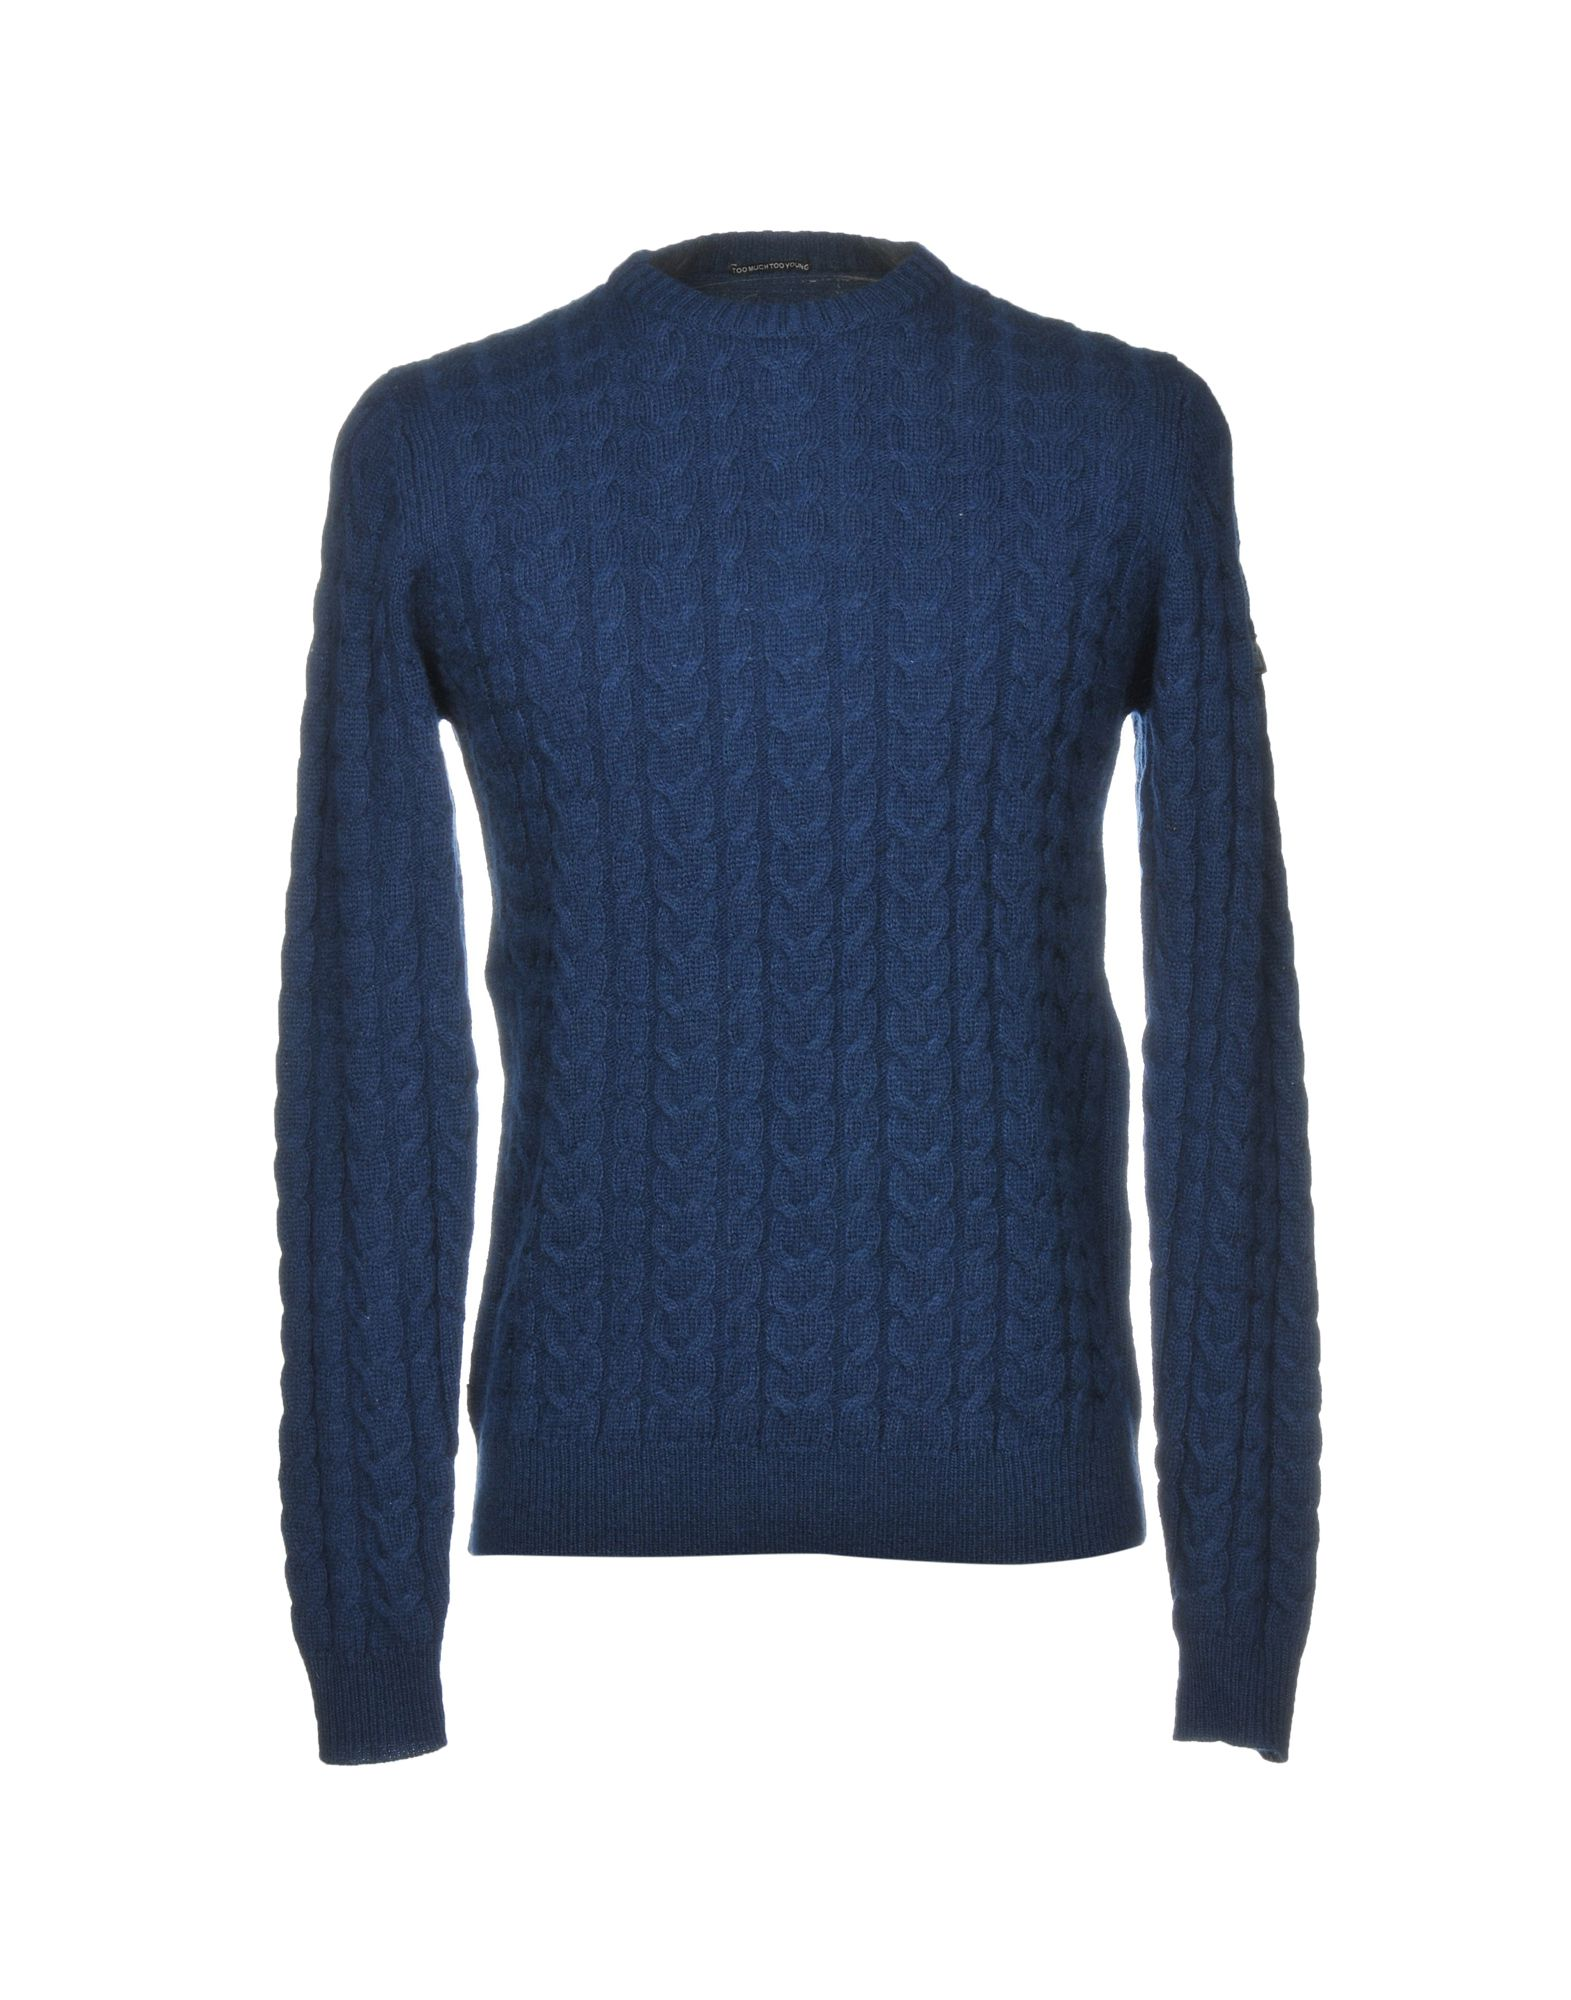 WEEKEND OFFENDER Sweater in Blue